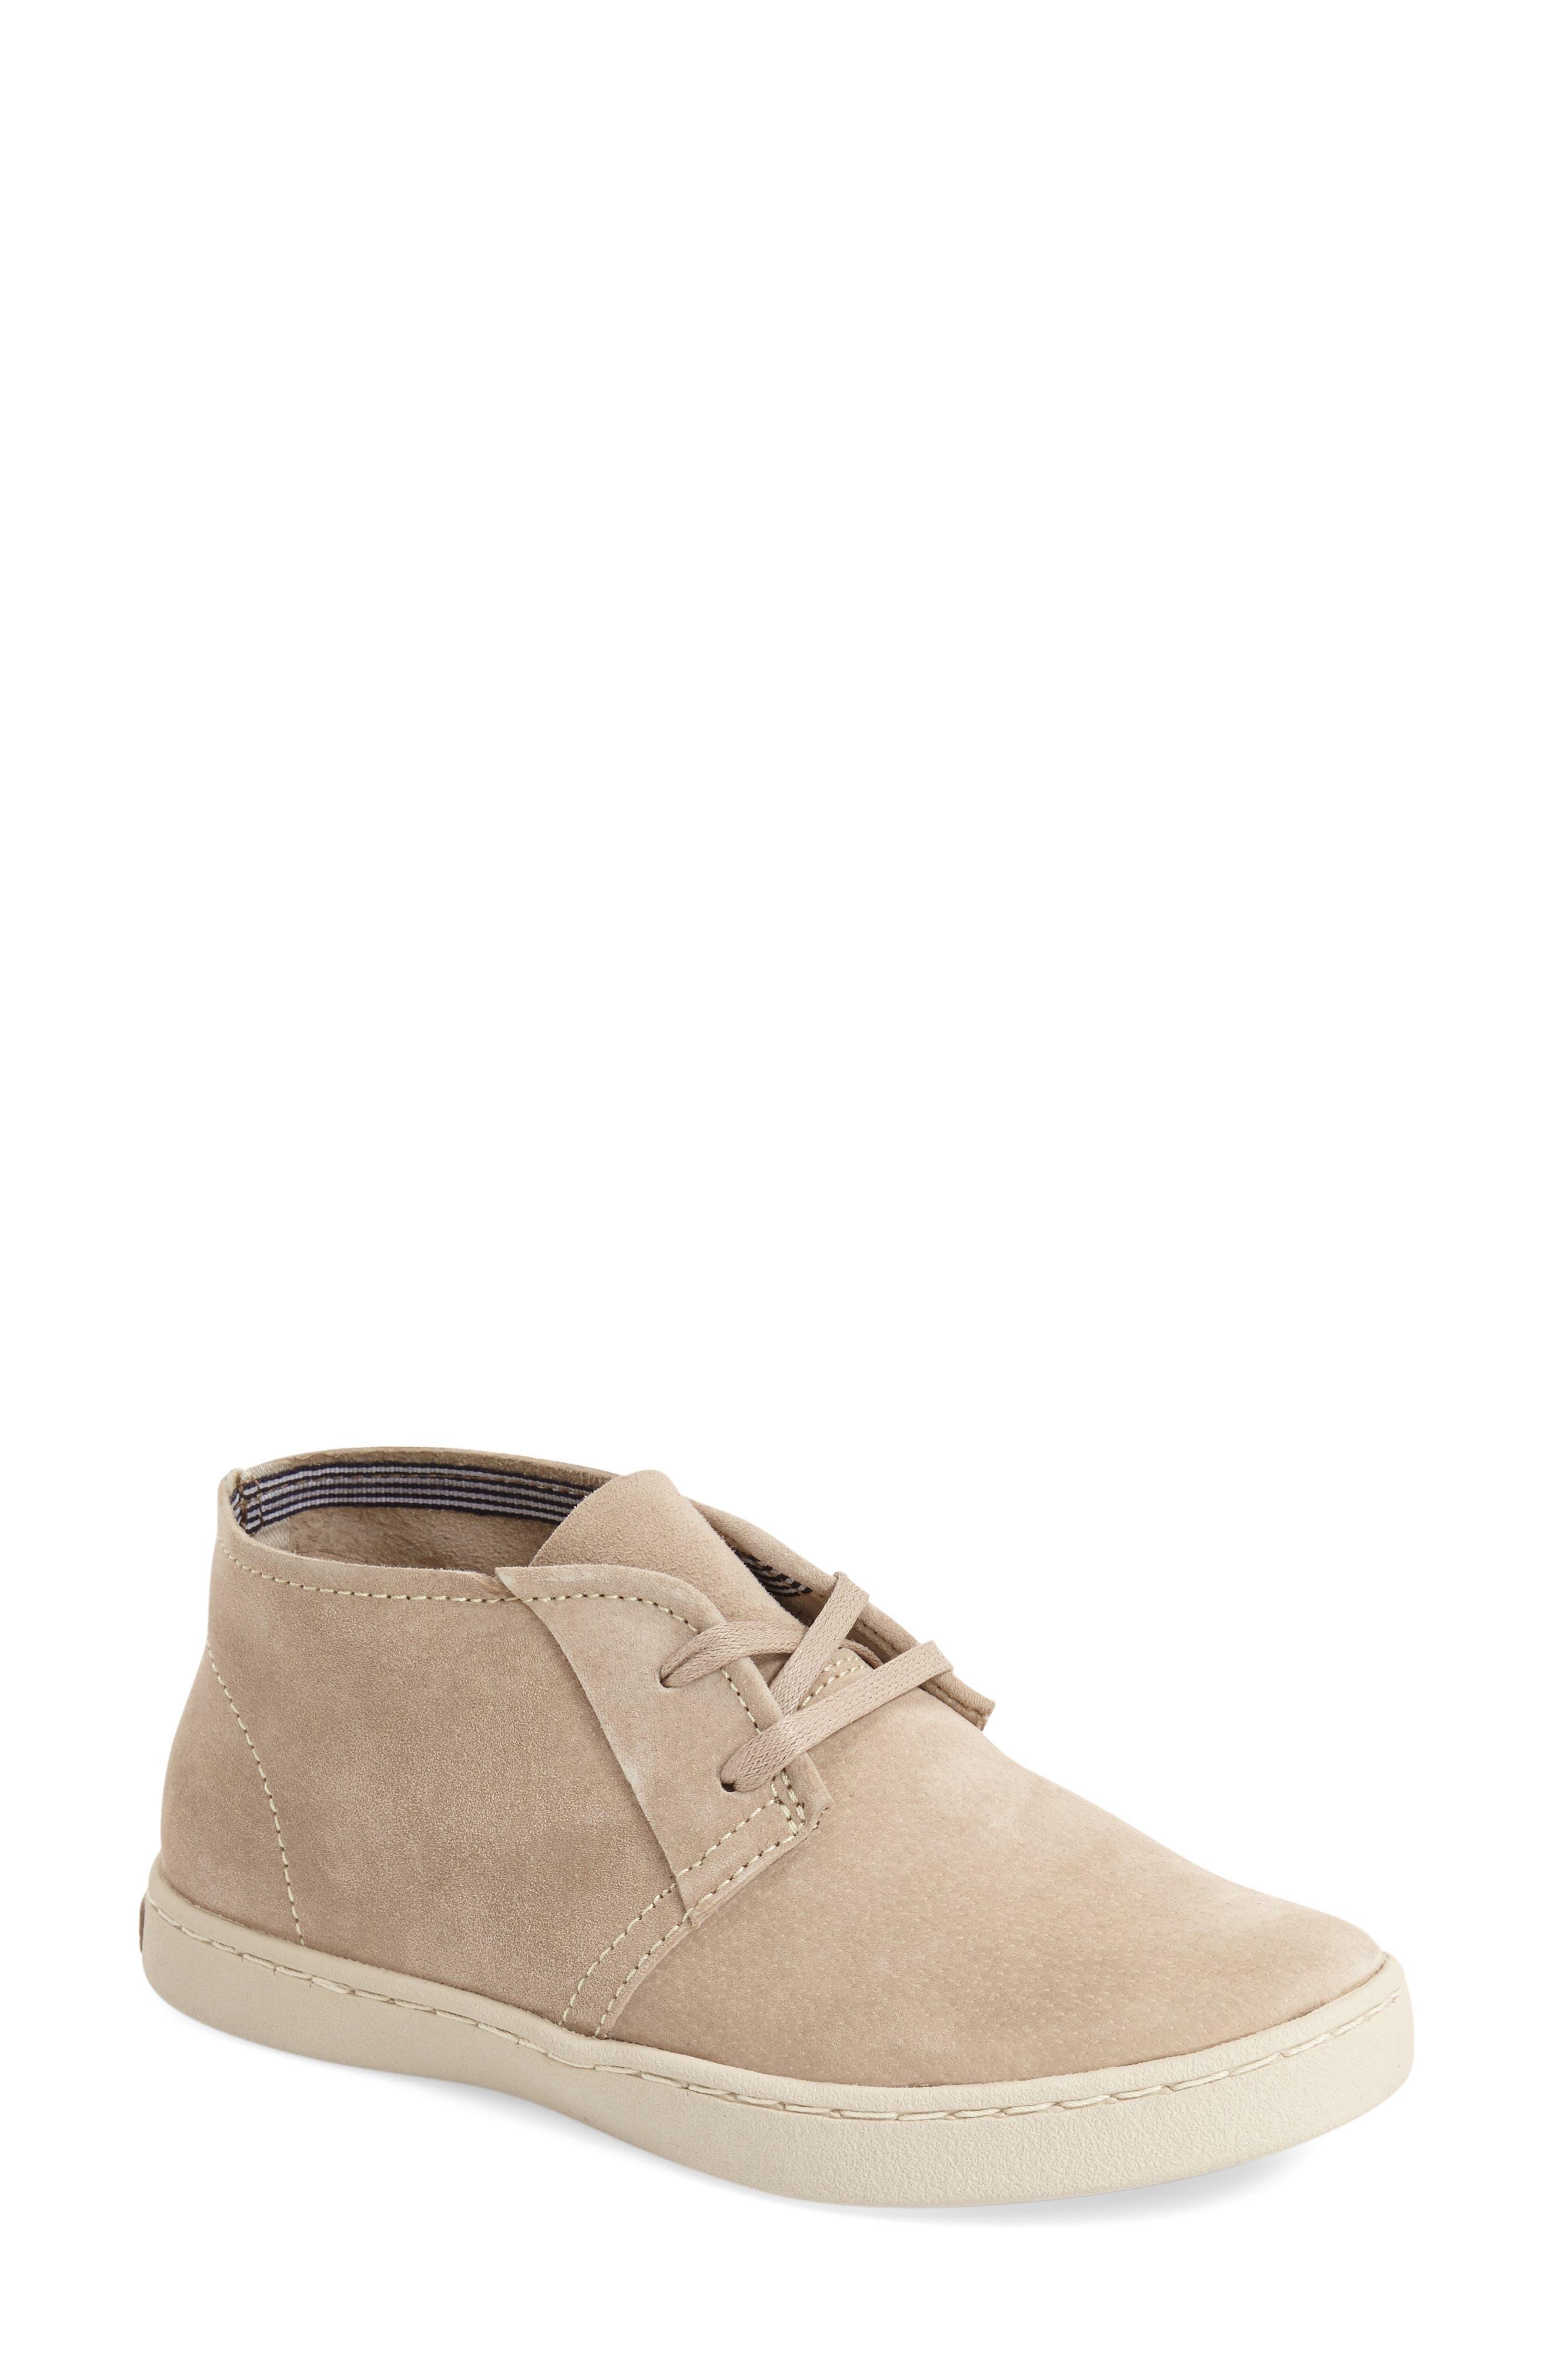 'Cille Gwen' Sneaker,                             Alternate thumbnail 24, color,